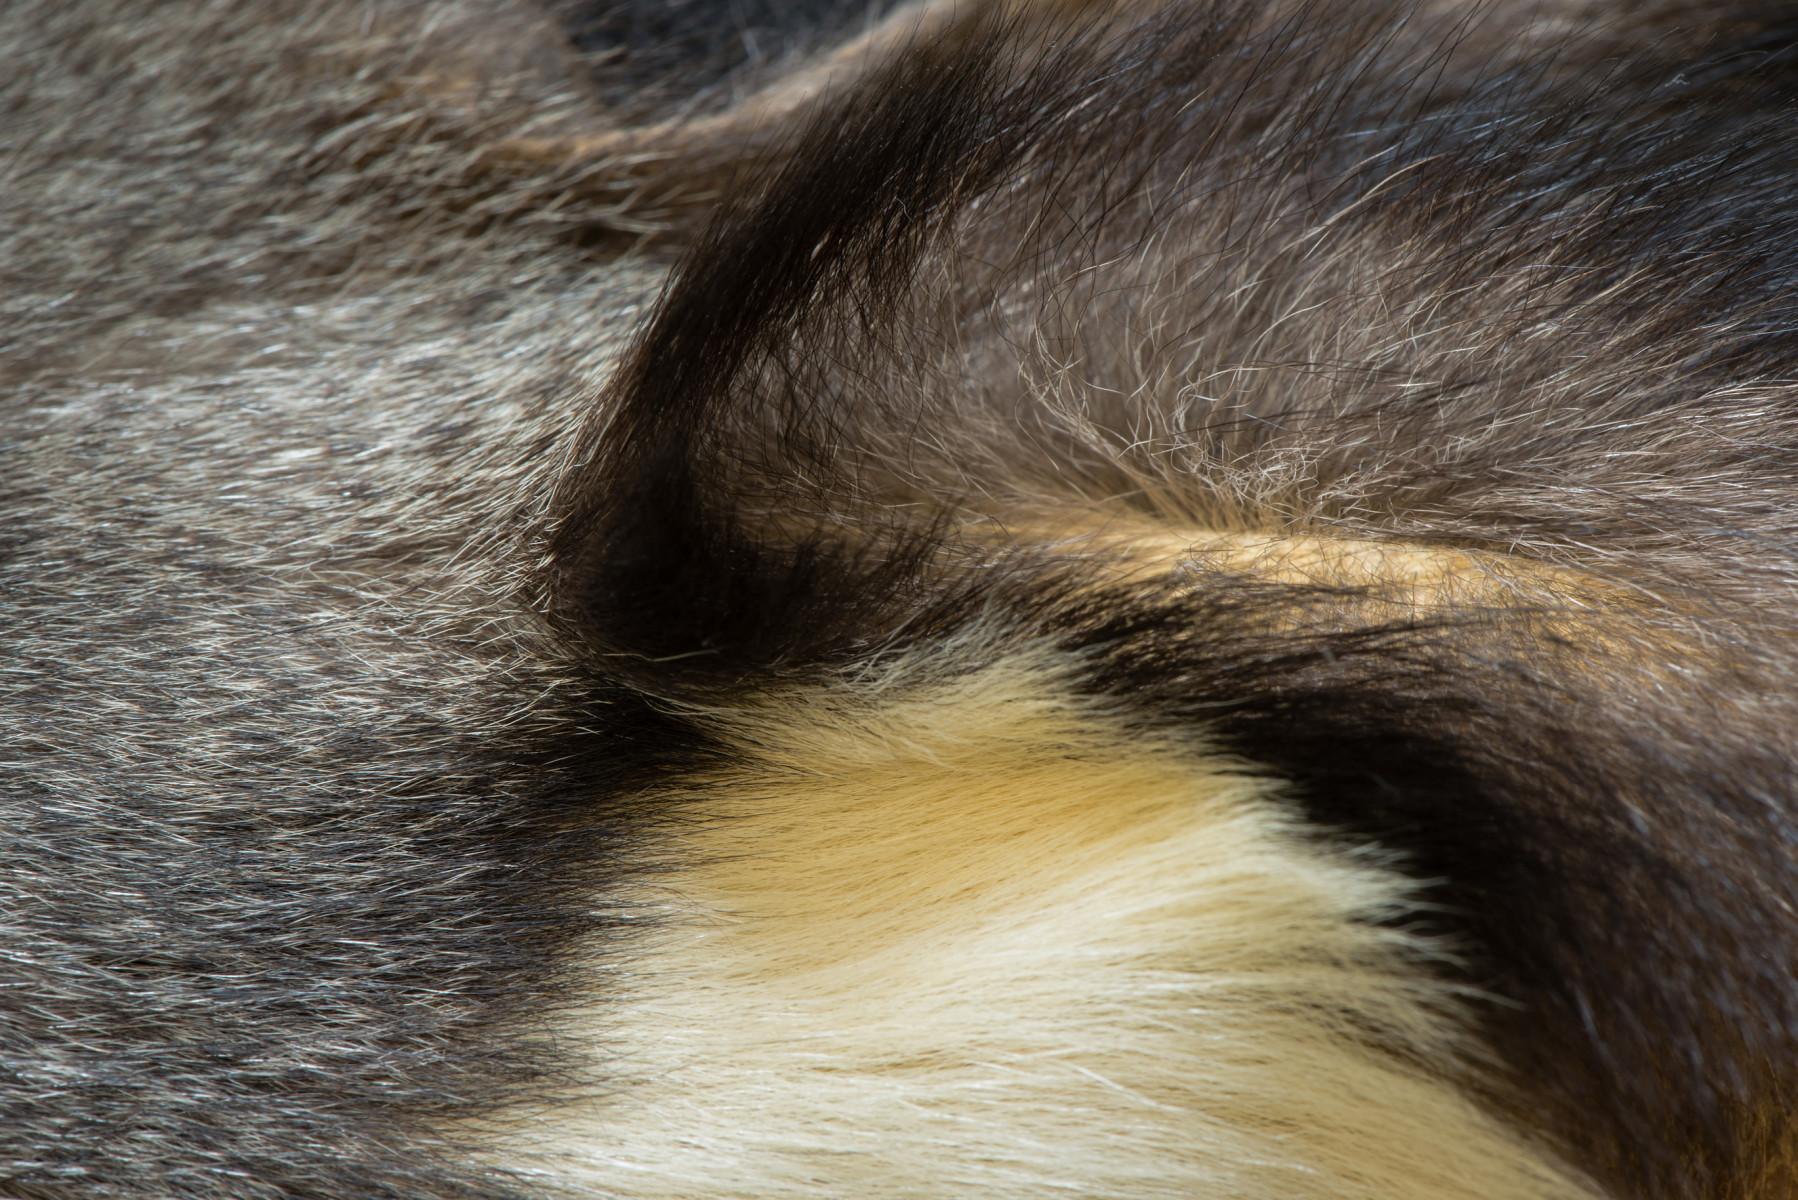 Red shanked Douc monkey mammal Pygathrix nemaeus - Extinction